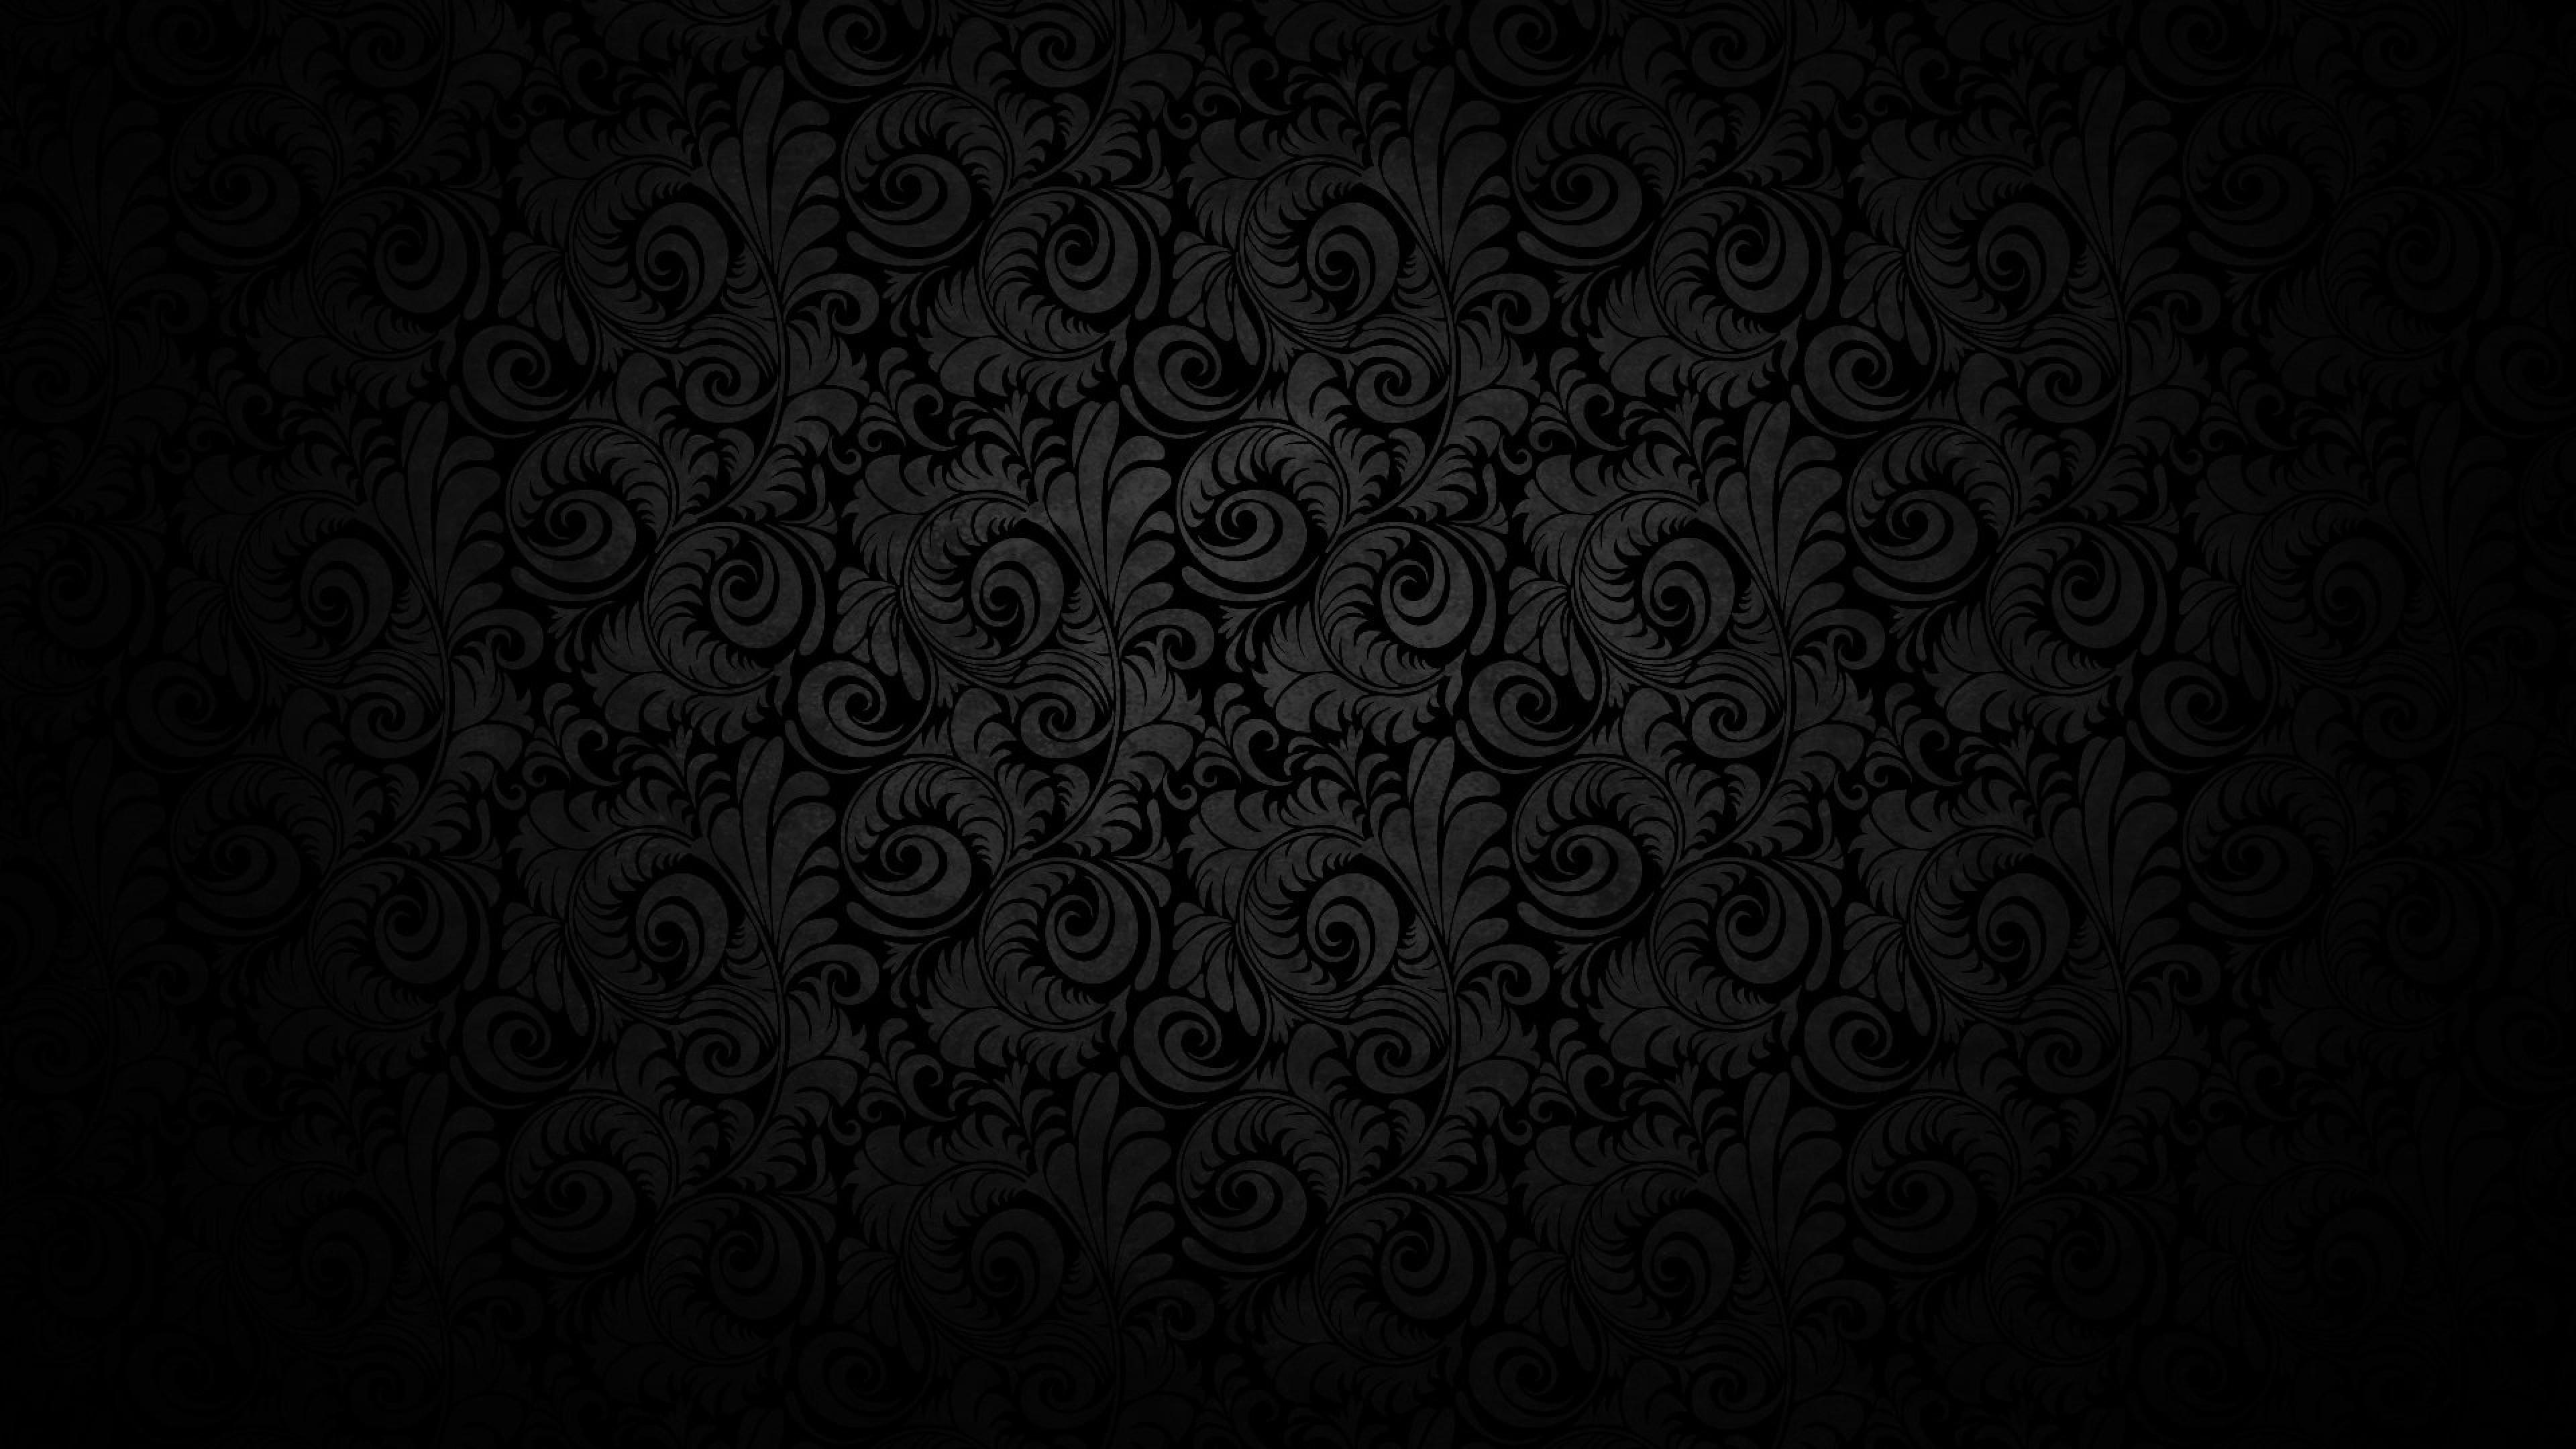 4k black and white wallpaper 48 images